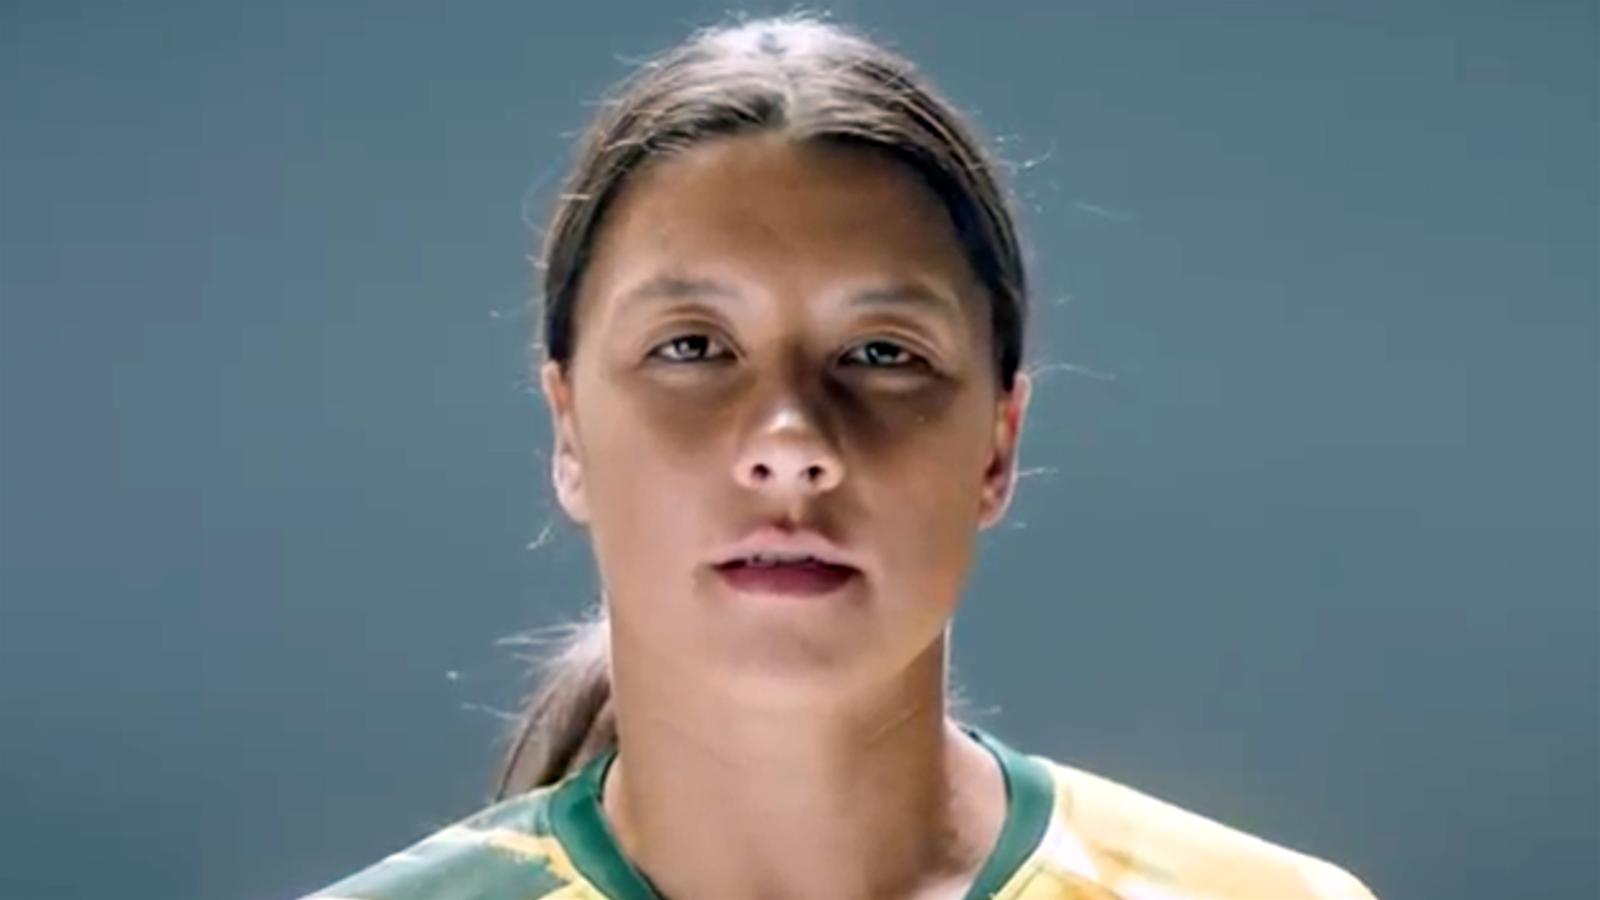 Watch! Sam Kerr fronts Australia's 2023 World Cup bid